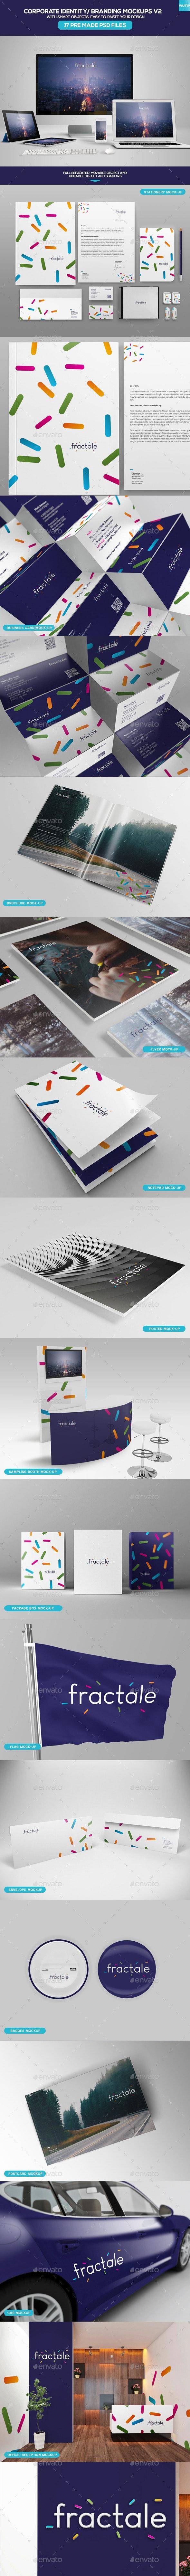 Corporate Identity - Branding Mockups V2 - Stationery Print